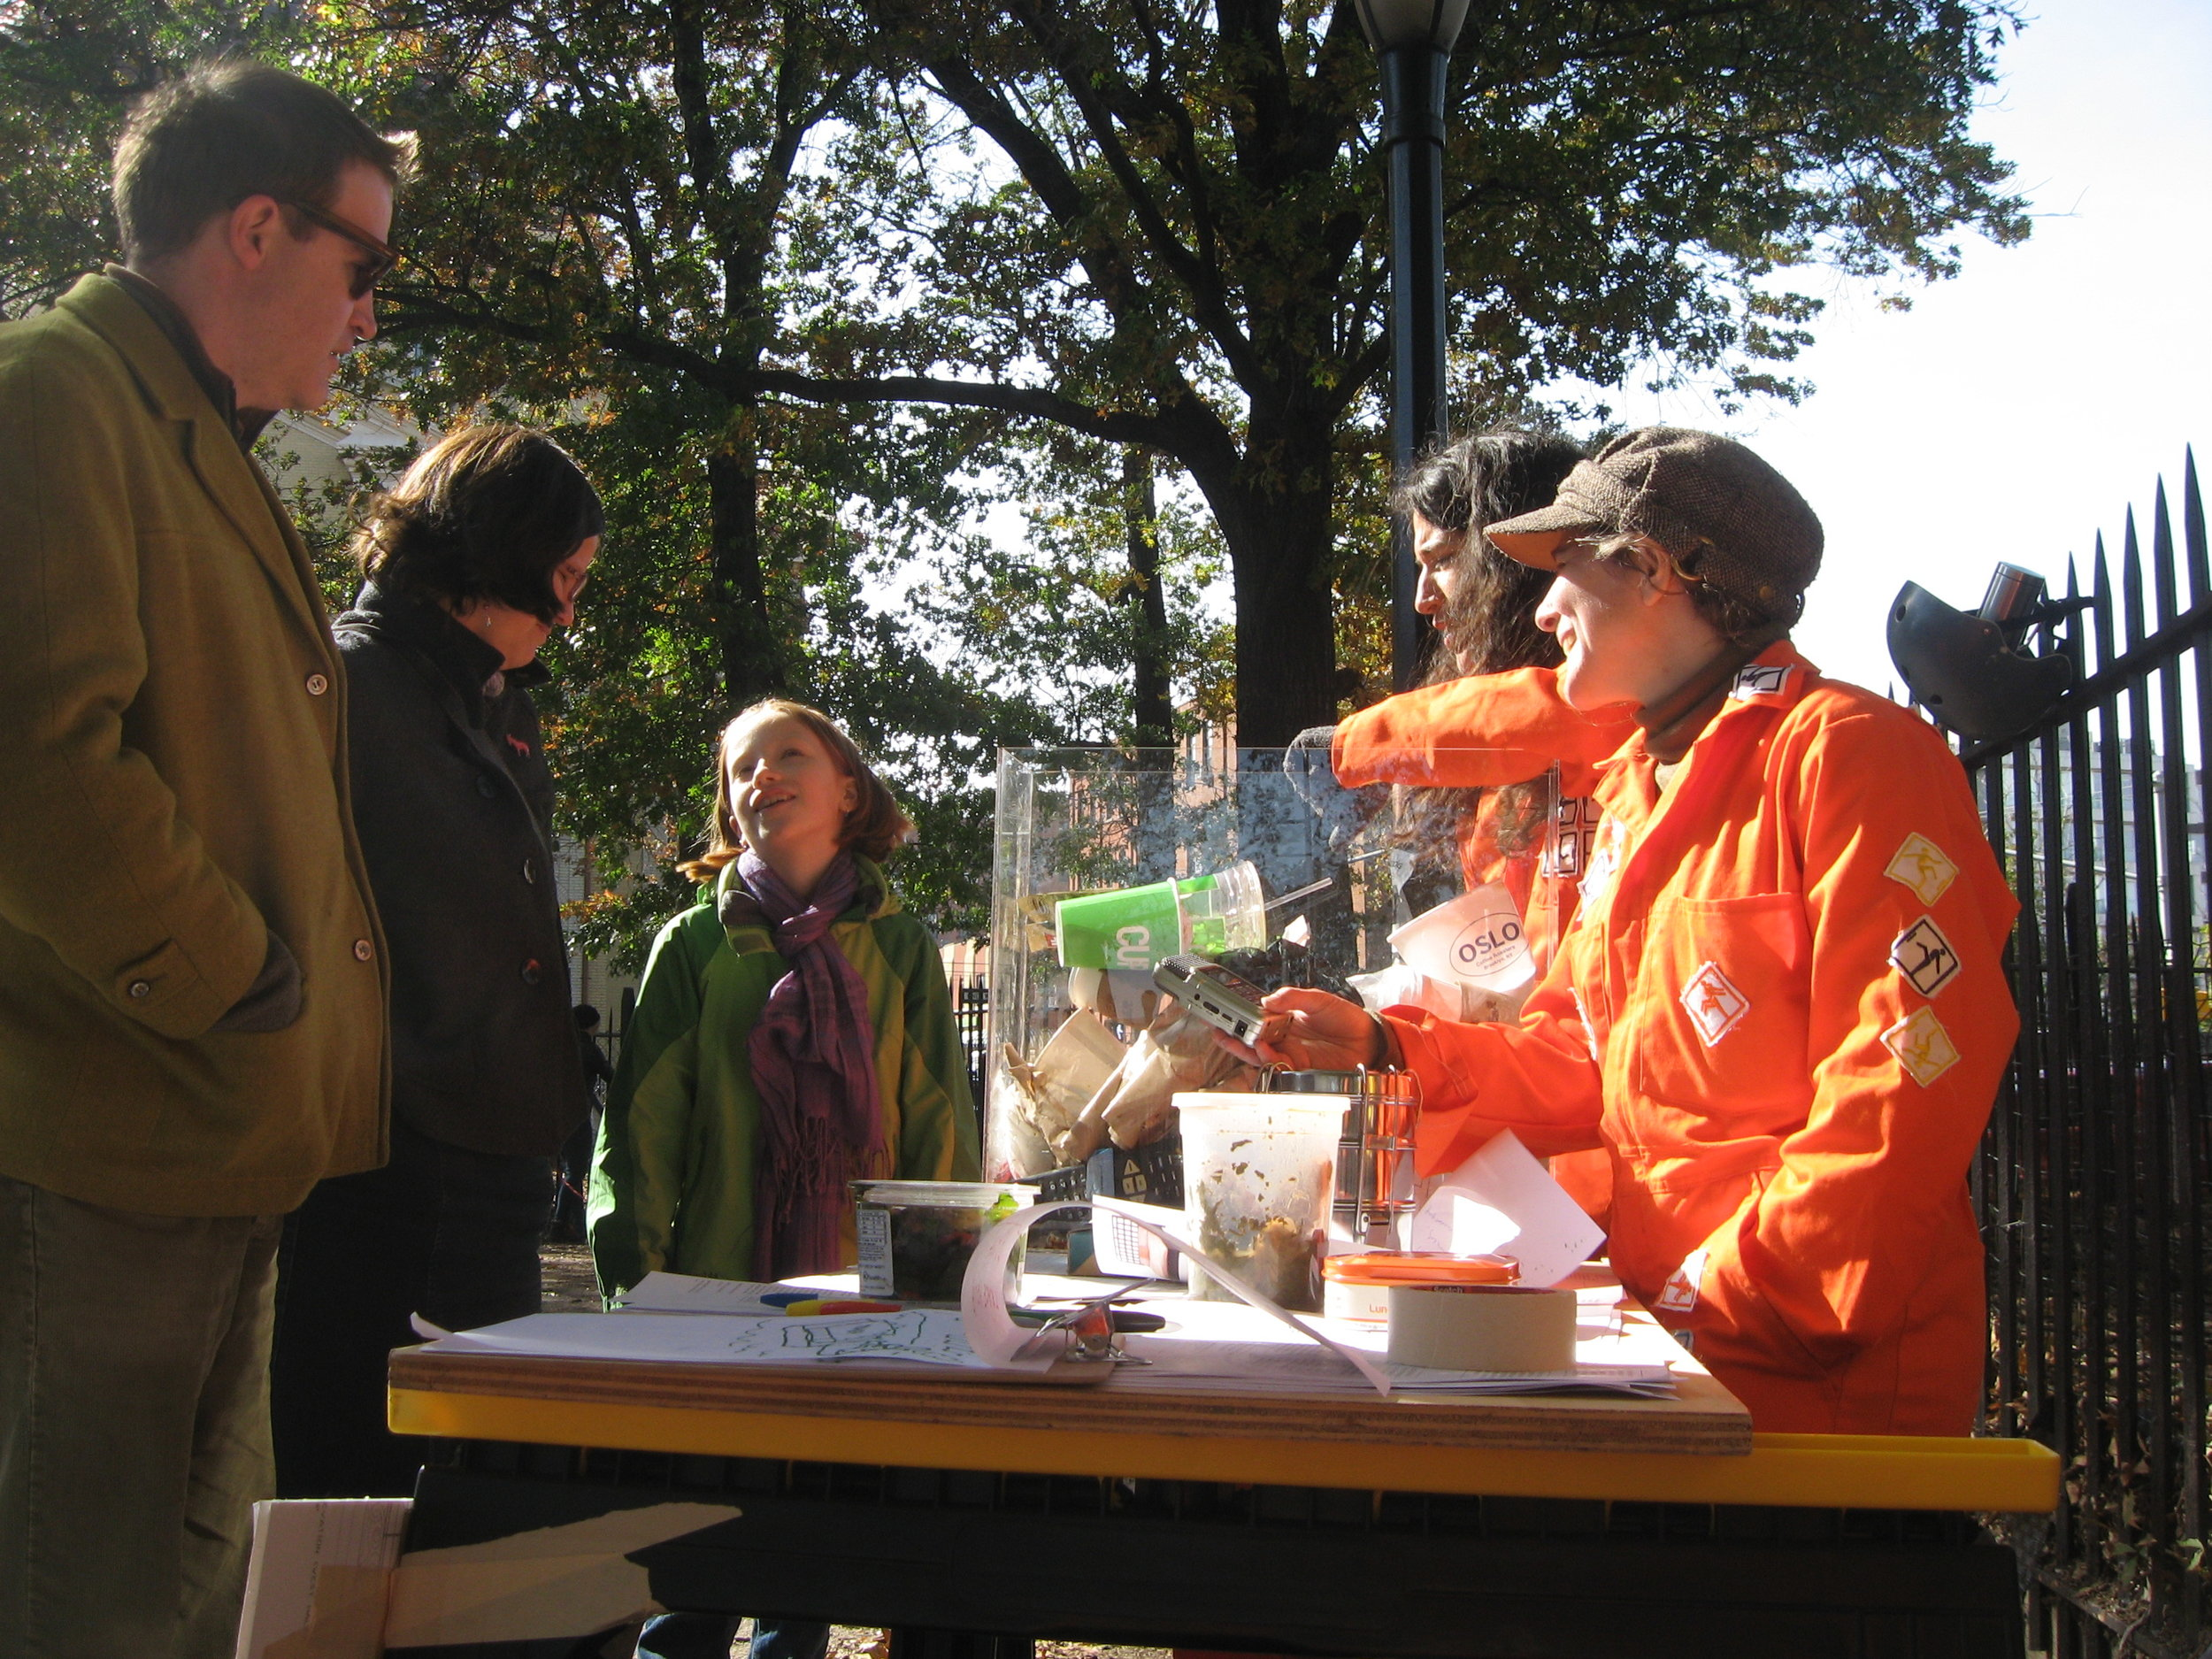 visitors-from-oregon-mccarren-park_5245430681_o.jpg